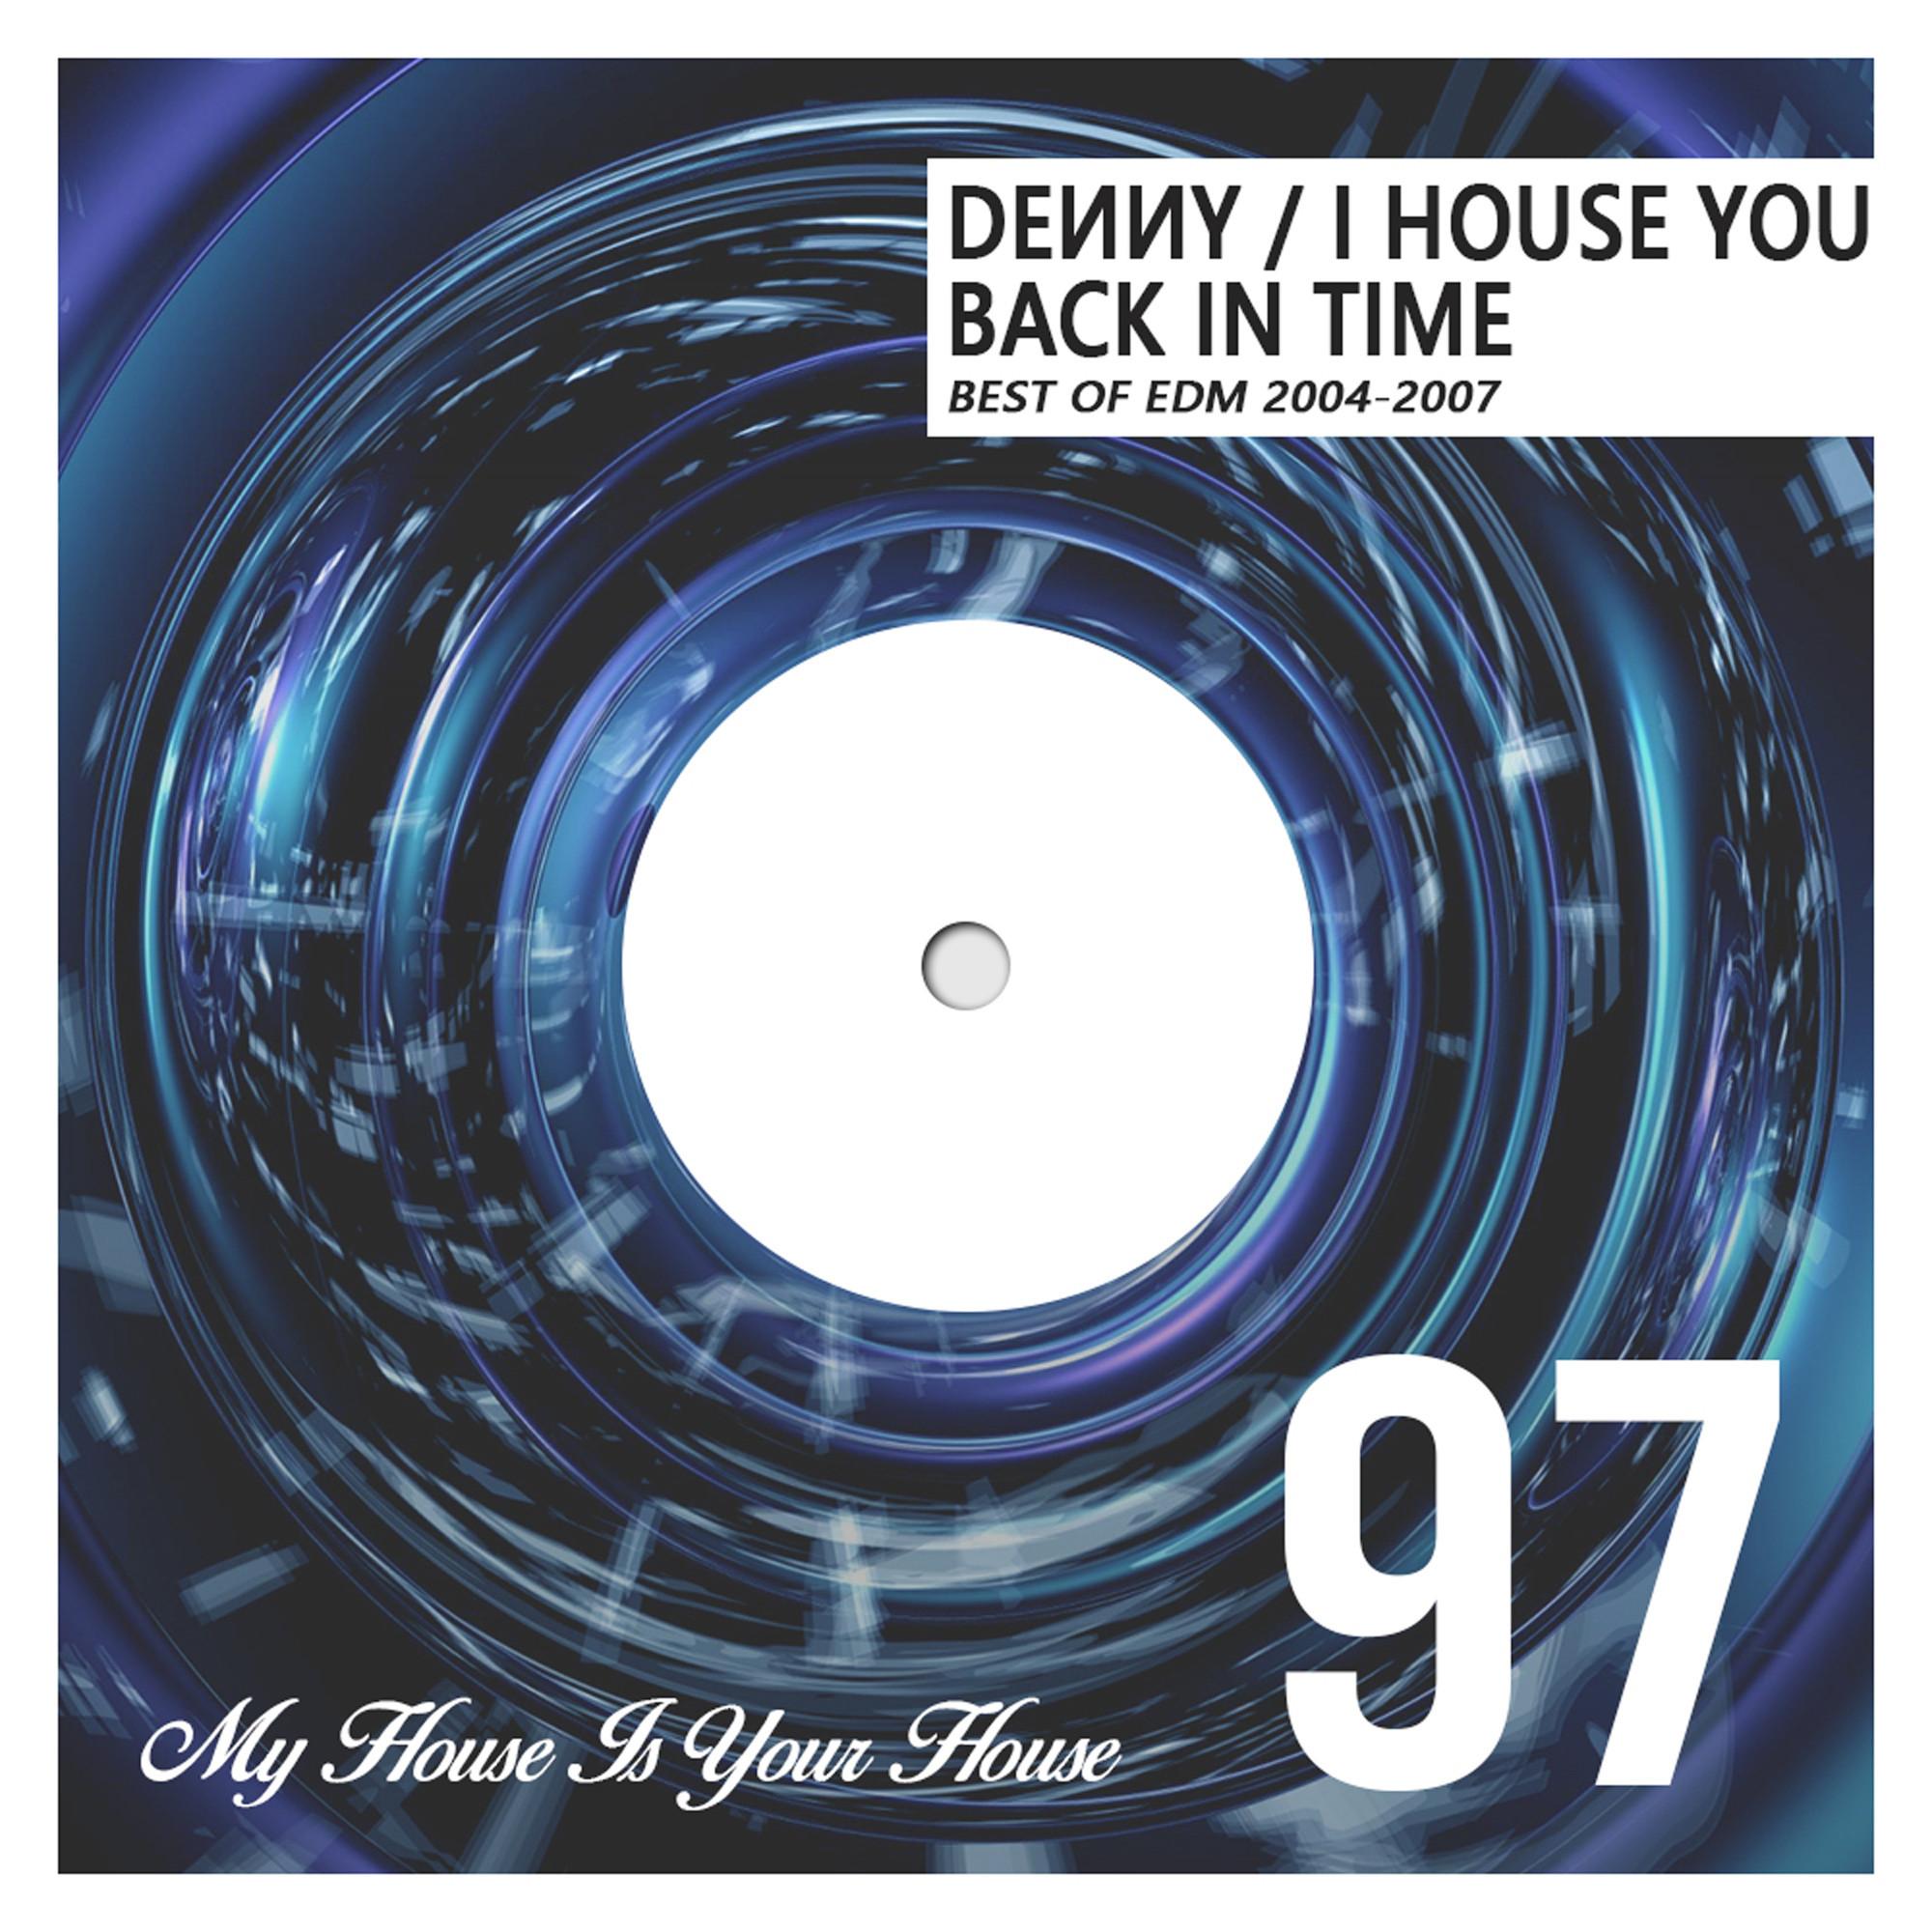 Denny - I House You 97 - Best of EDM 2004-2007 Megamix